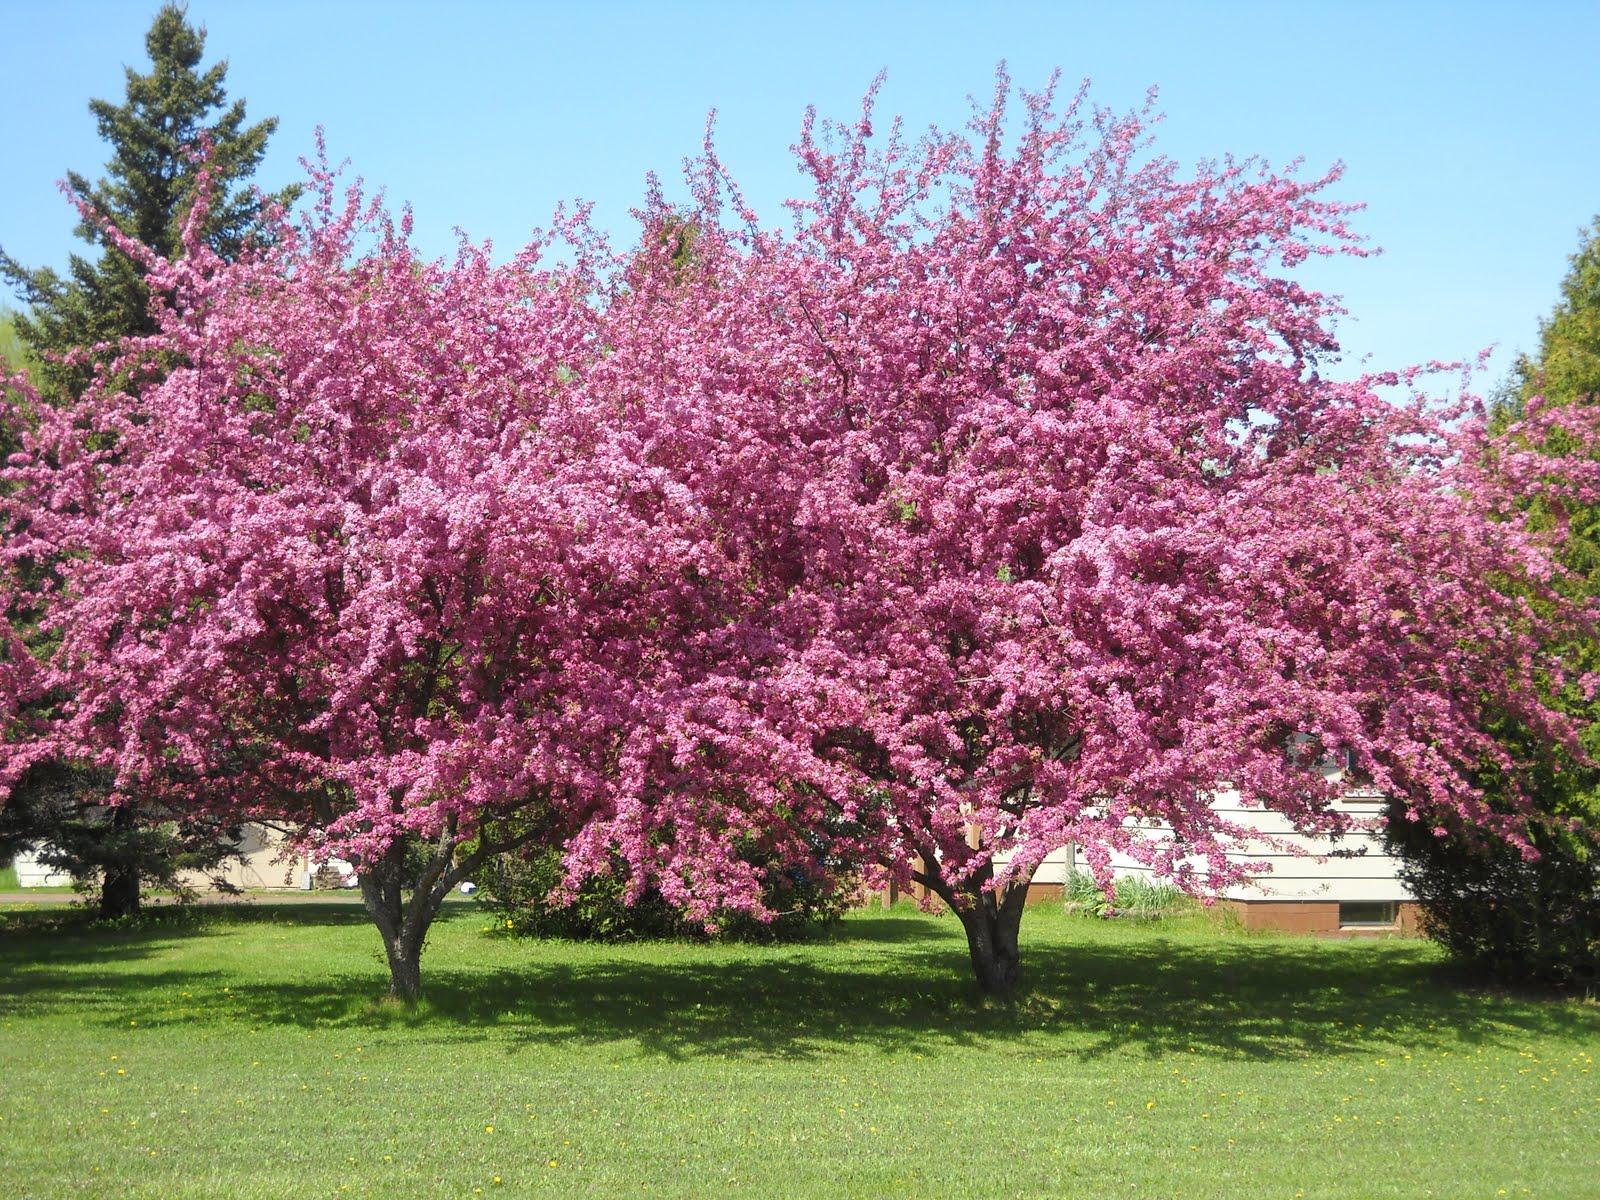 Art s Bayfield Almanac 5 17 10 THE DIVERSITY OF FLOWERING CRAB TREES